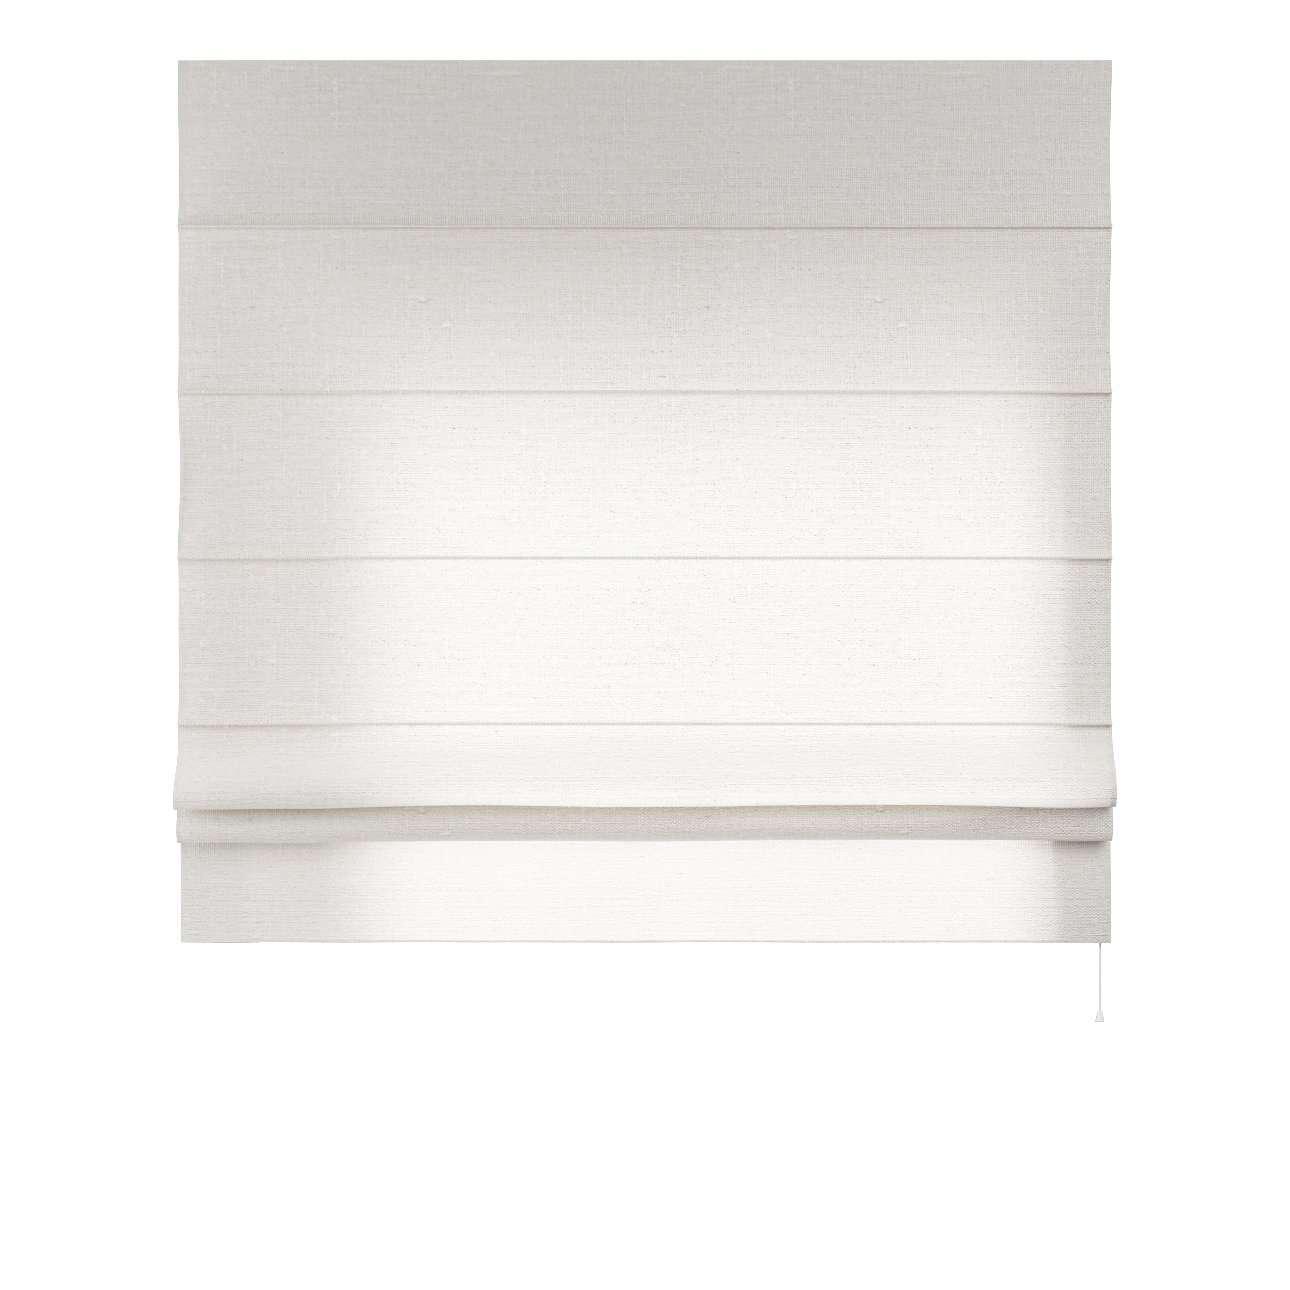 Foldegardin Paris<br/>Med lige flæse 80 x 170 cm fra kollektionen Linen, Stof: 392-04